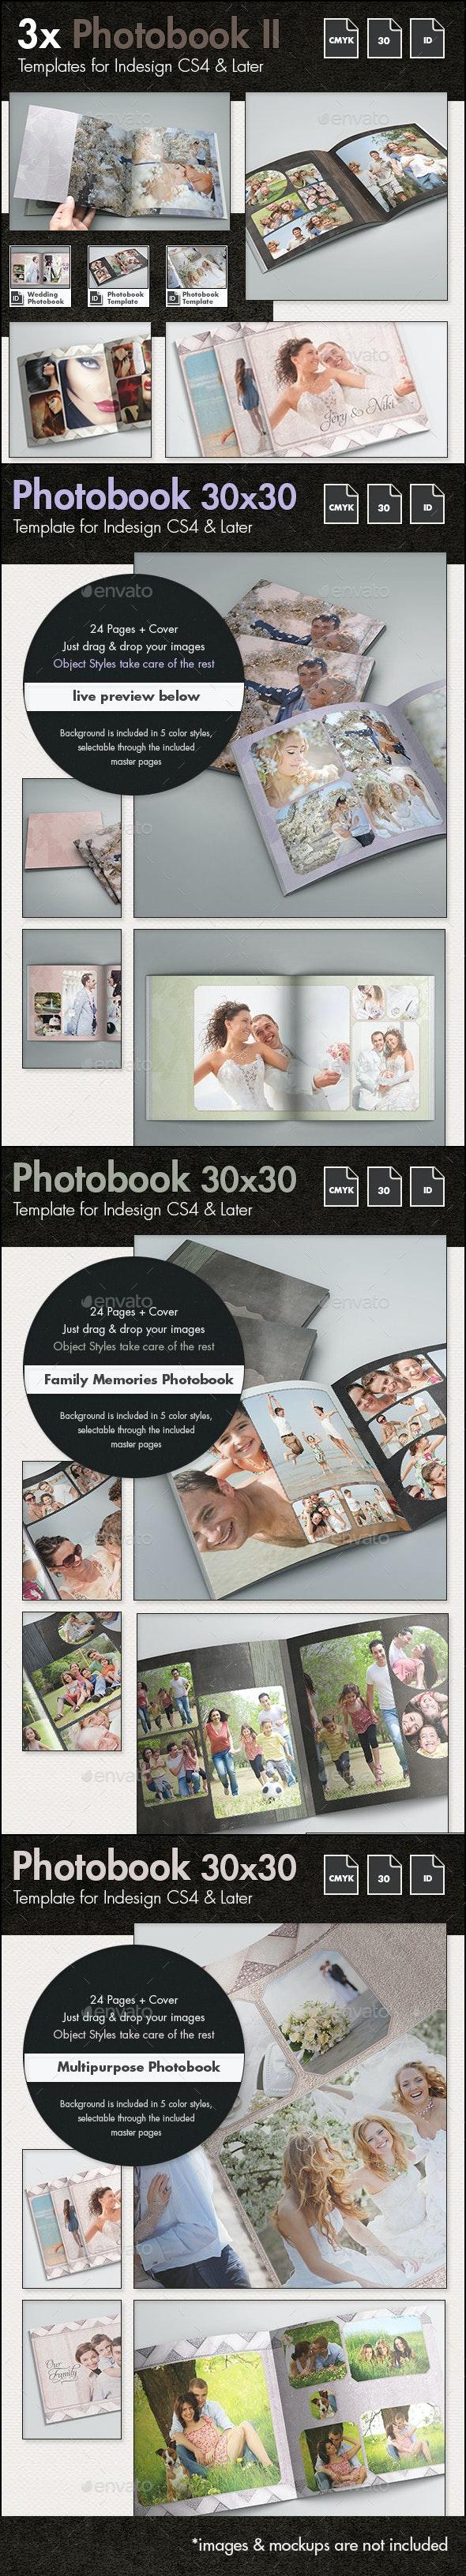 3x Photobook Album Template Bundle II - Photo Albums Print Templates